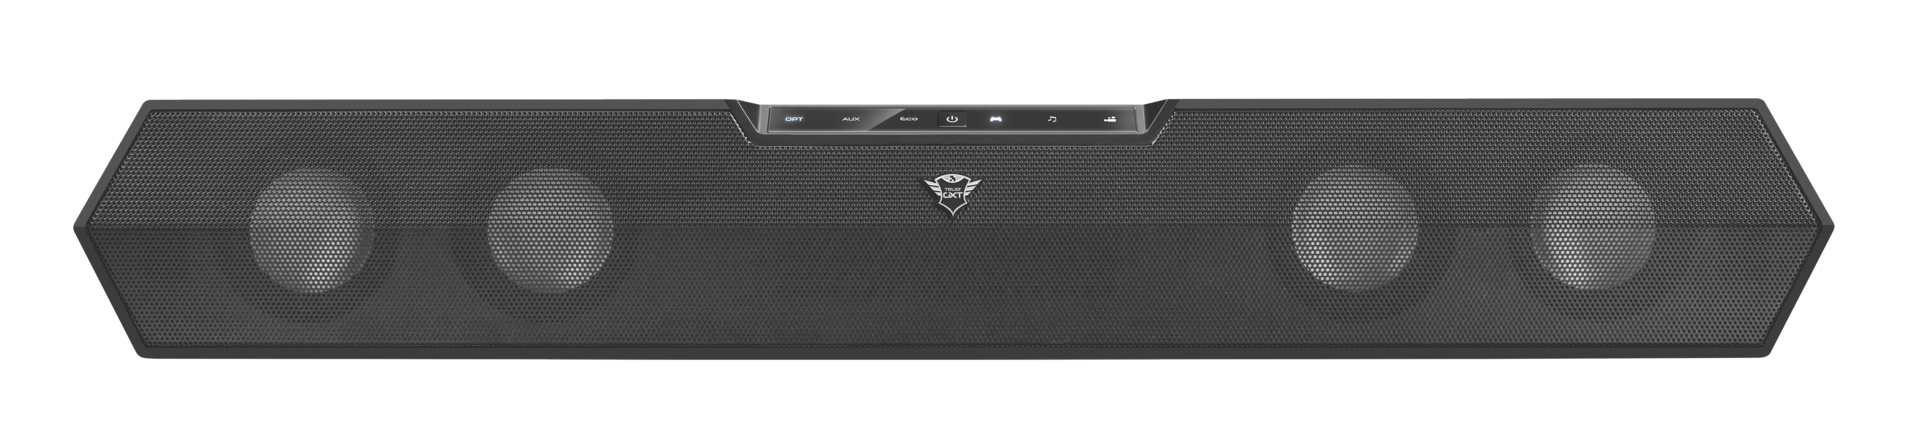 GXT 668 Tytan Sound bar system (2.1-channel, 60 Watt)